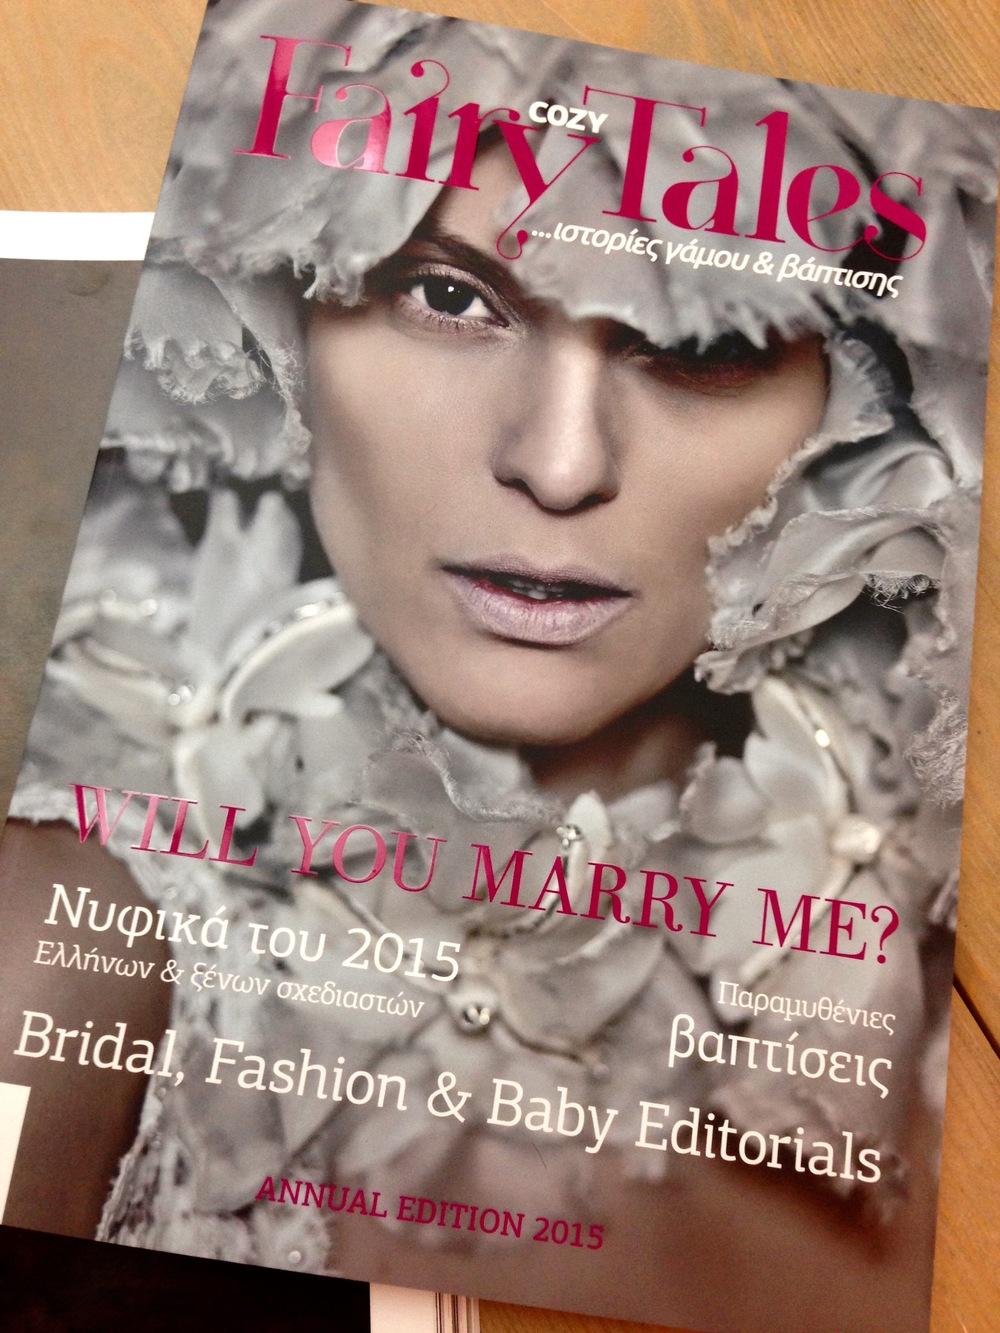 Cozy FairyTales περιοδικό γάμου & βάπτισης